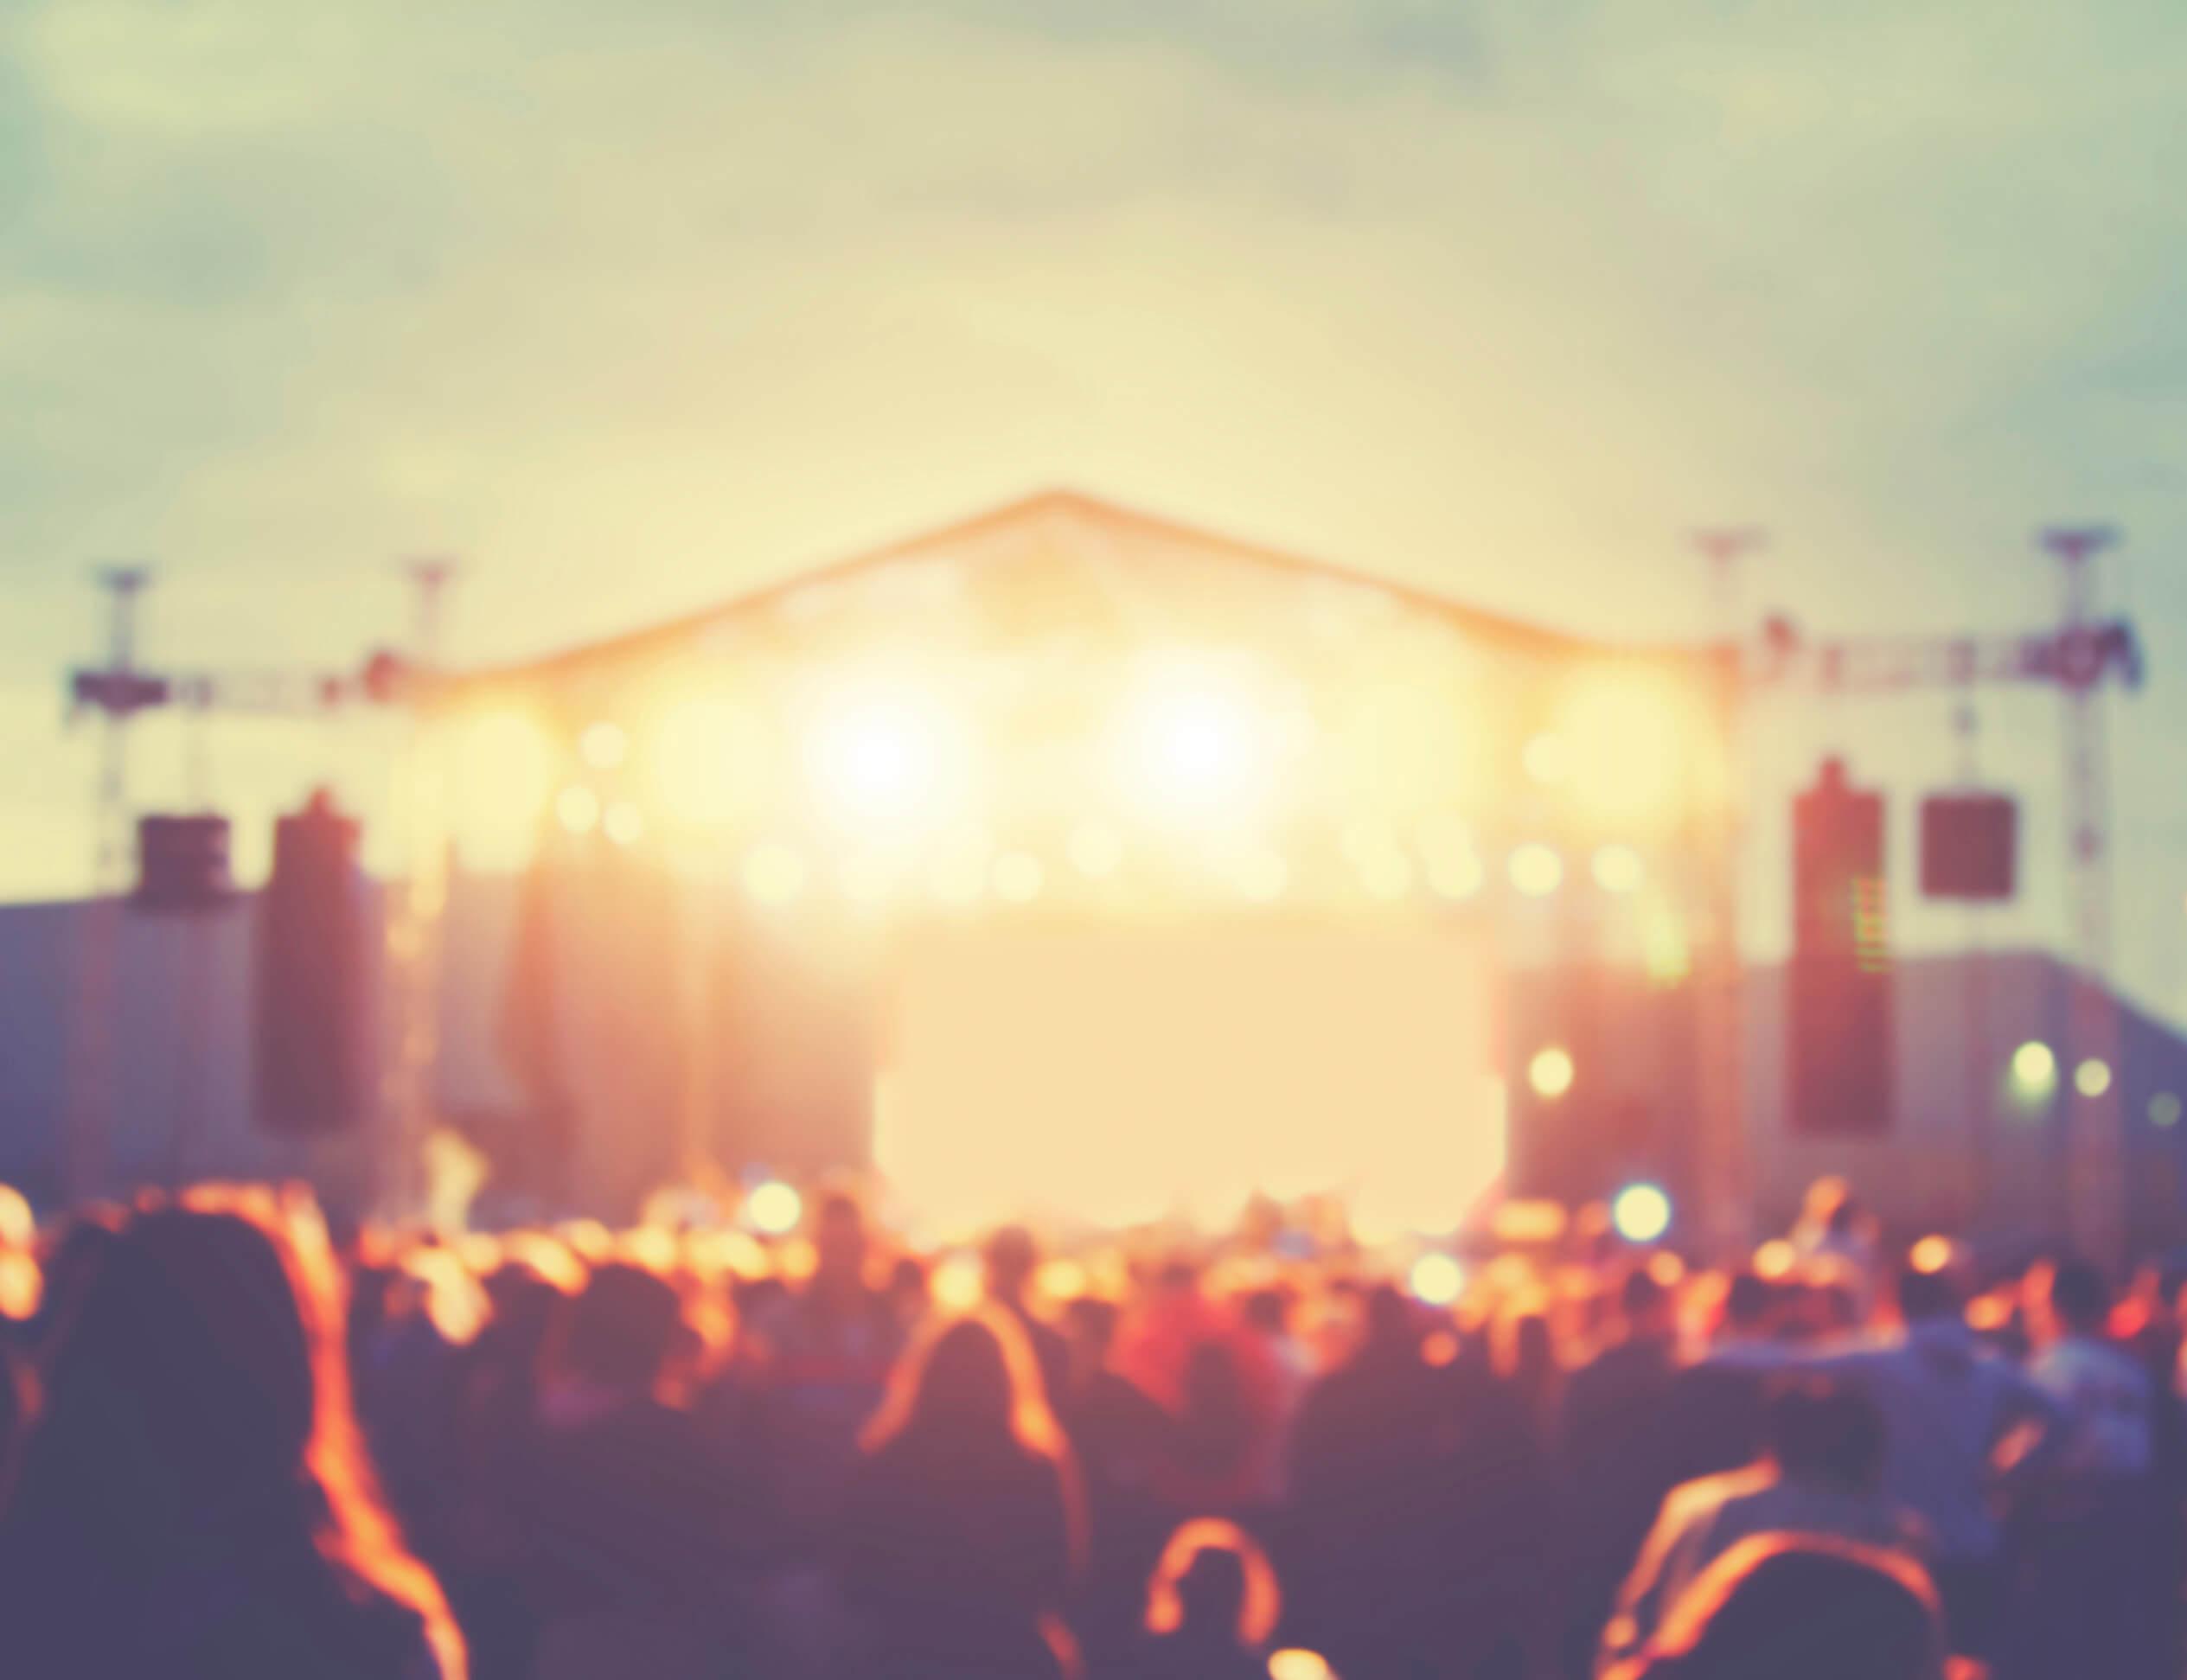 sziget festival budapest concert